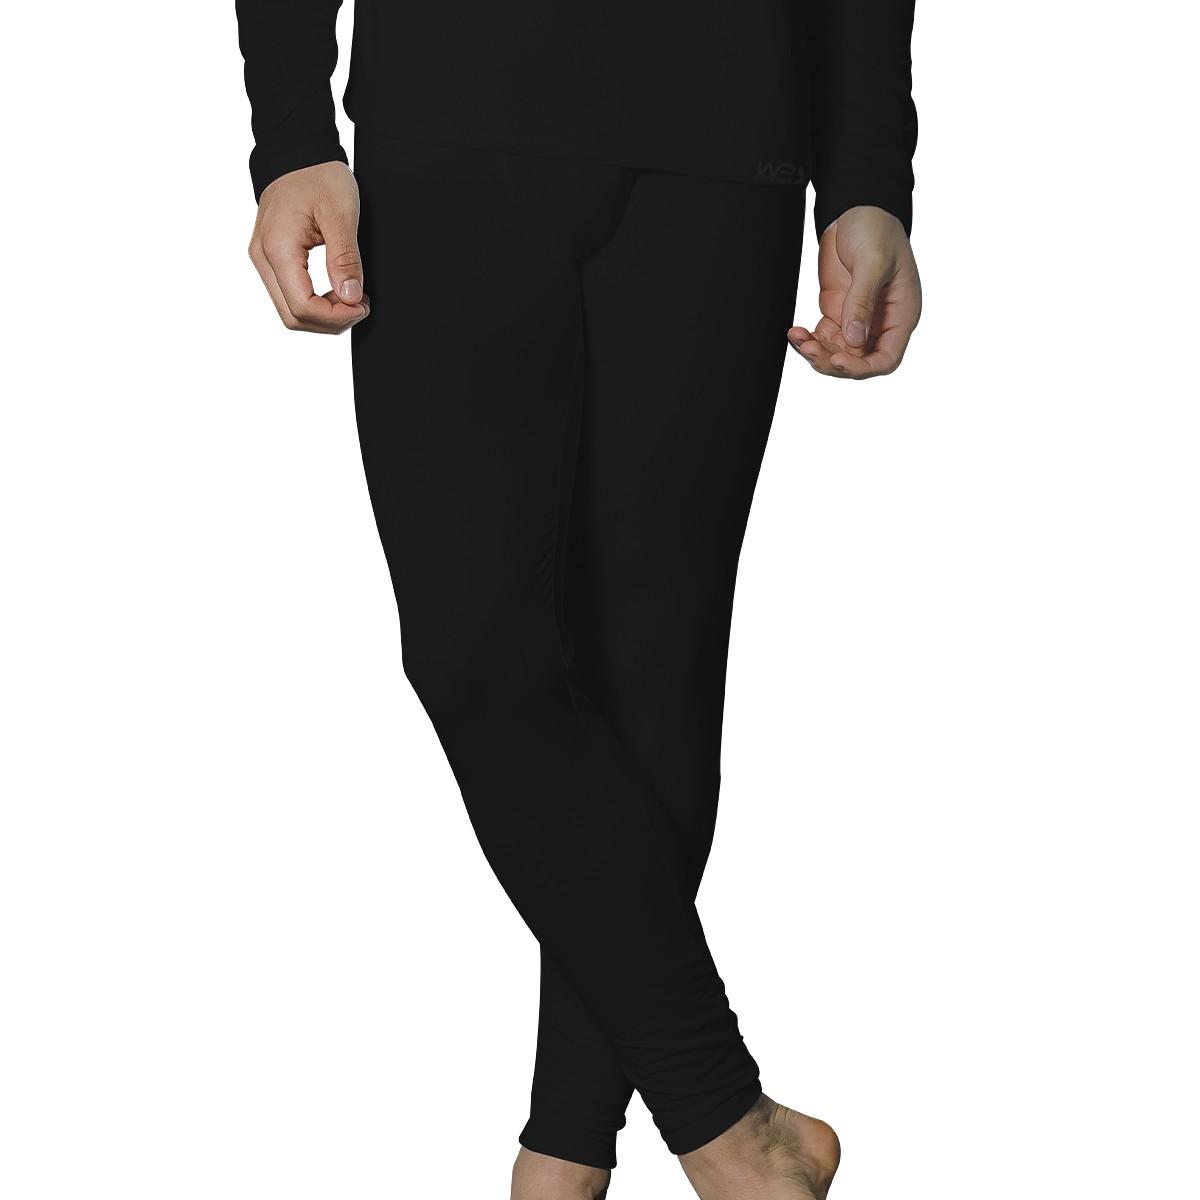 Calça Térmica Masculina Segunda Pele Long John Fitness